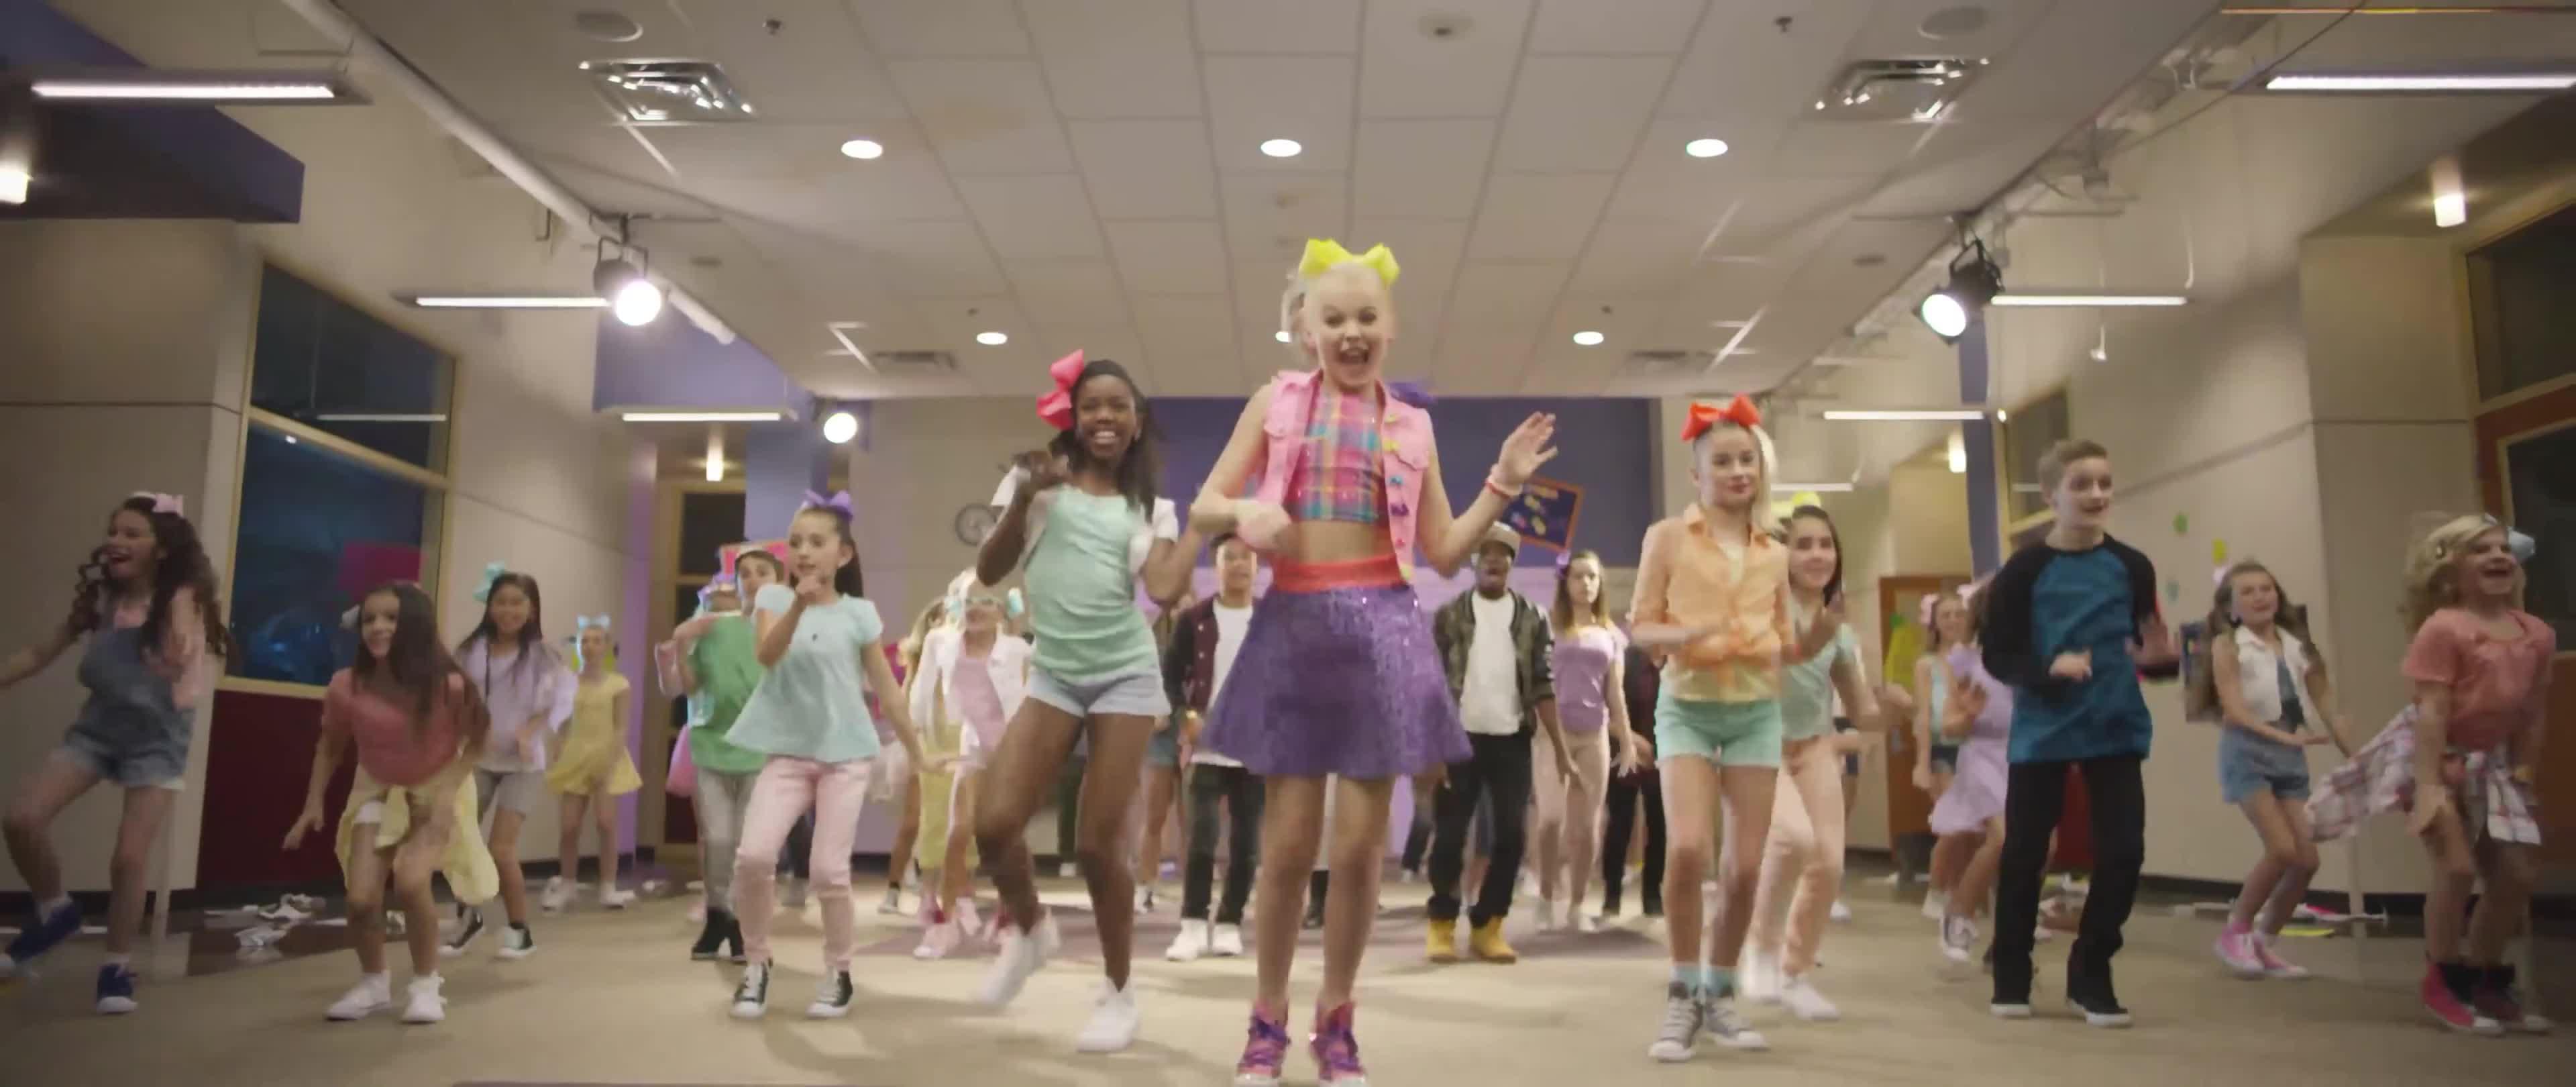 ALDC, Abby Lee, Abby Lee Dance Company, Celebrity, Dance Moms, JoJo, JoJo Siwa, JoJo's Juice, dancer, dancing, JoJo Siwa - BOOMERANG (Official Video) GIFs